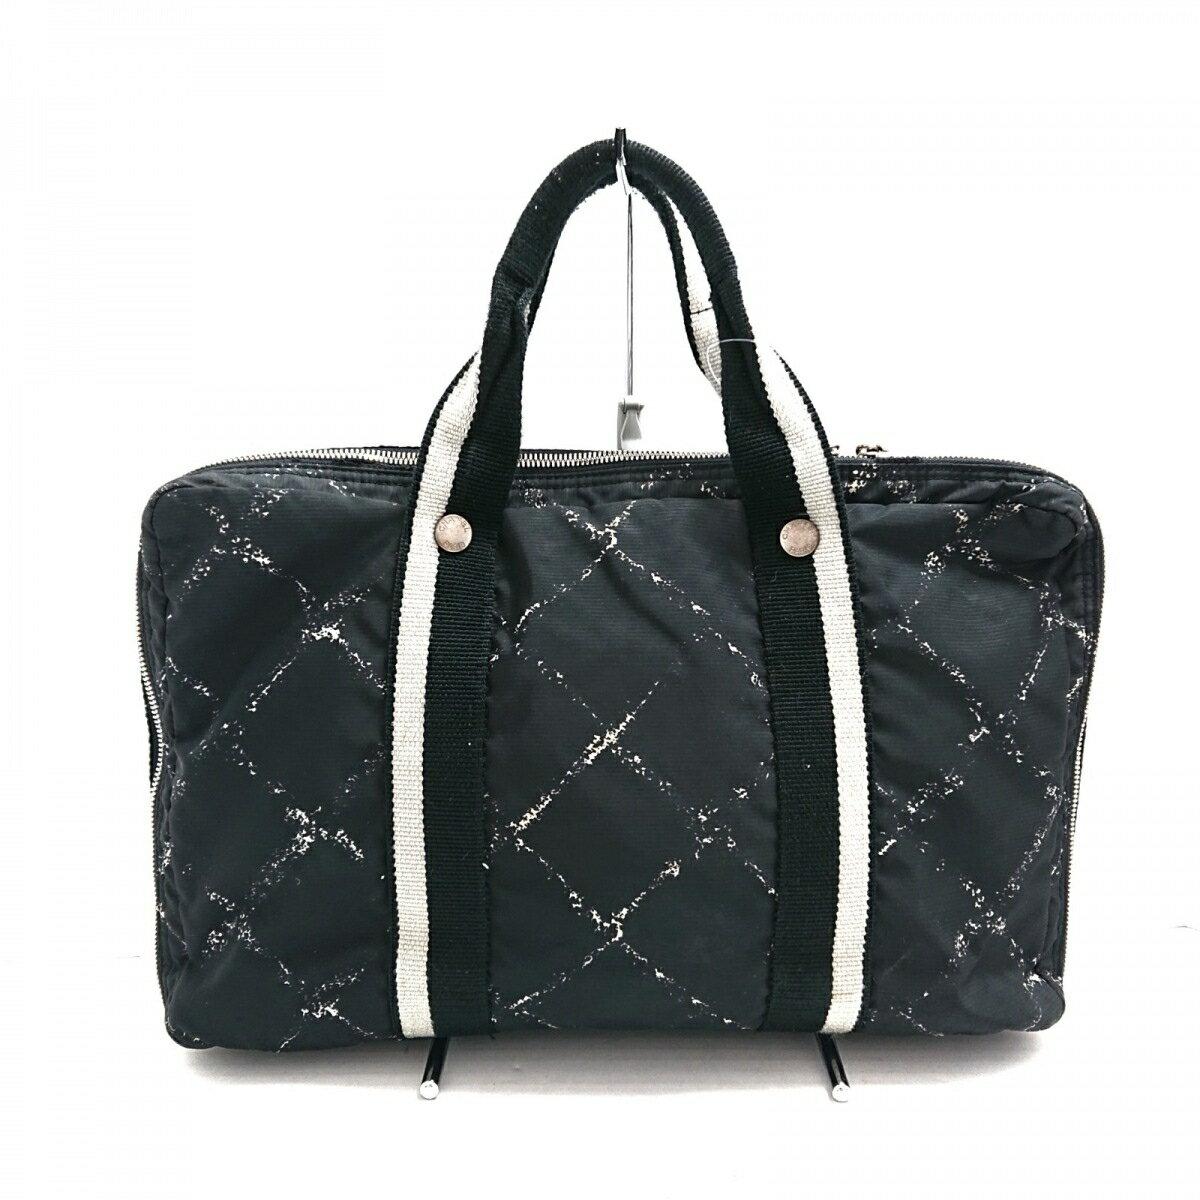 CHANEL nylon bag CHANEL()